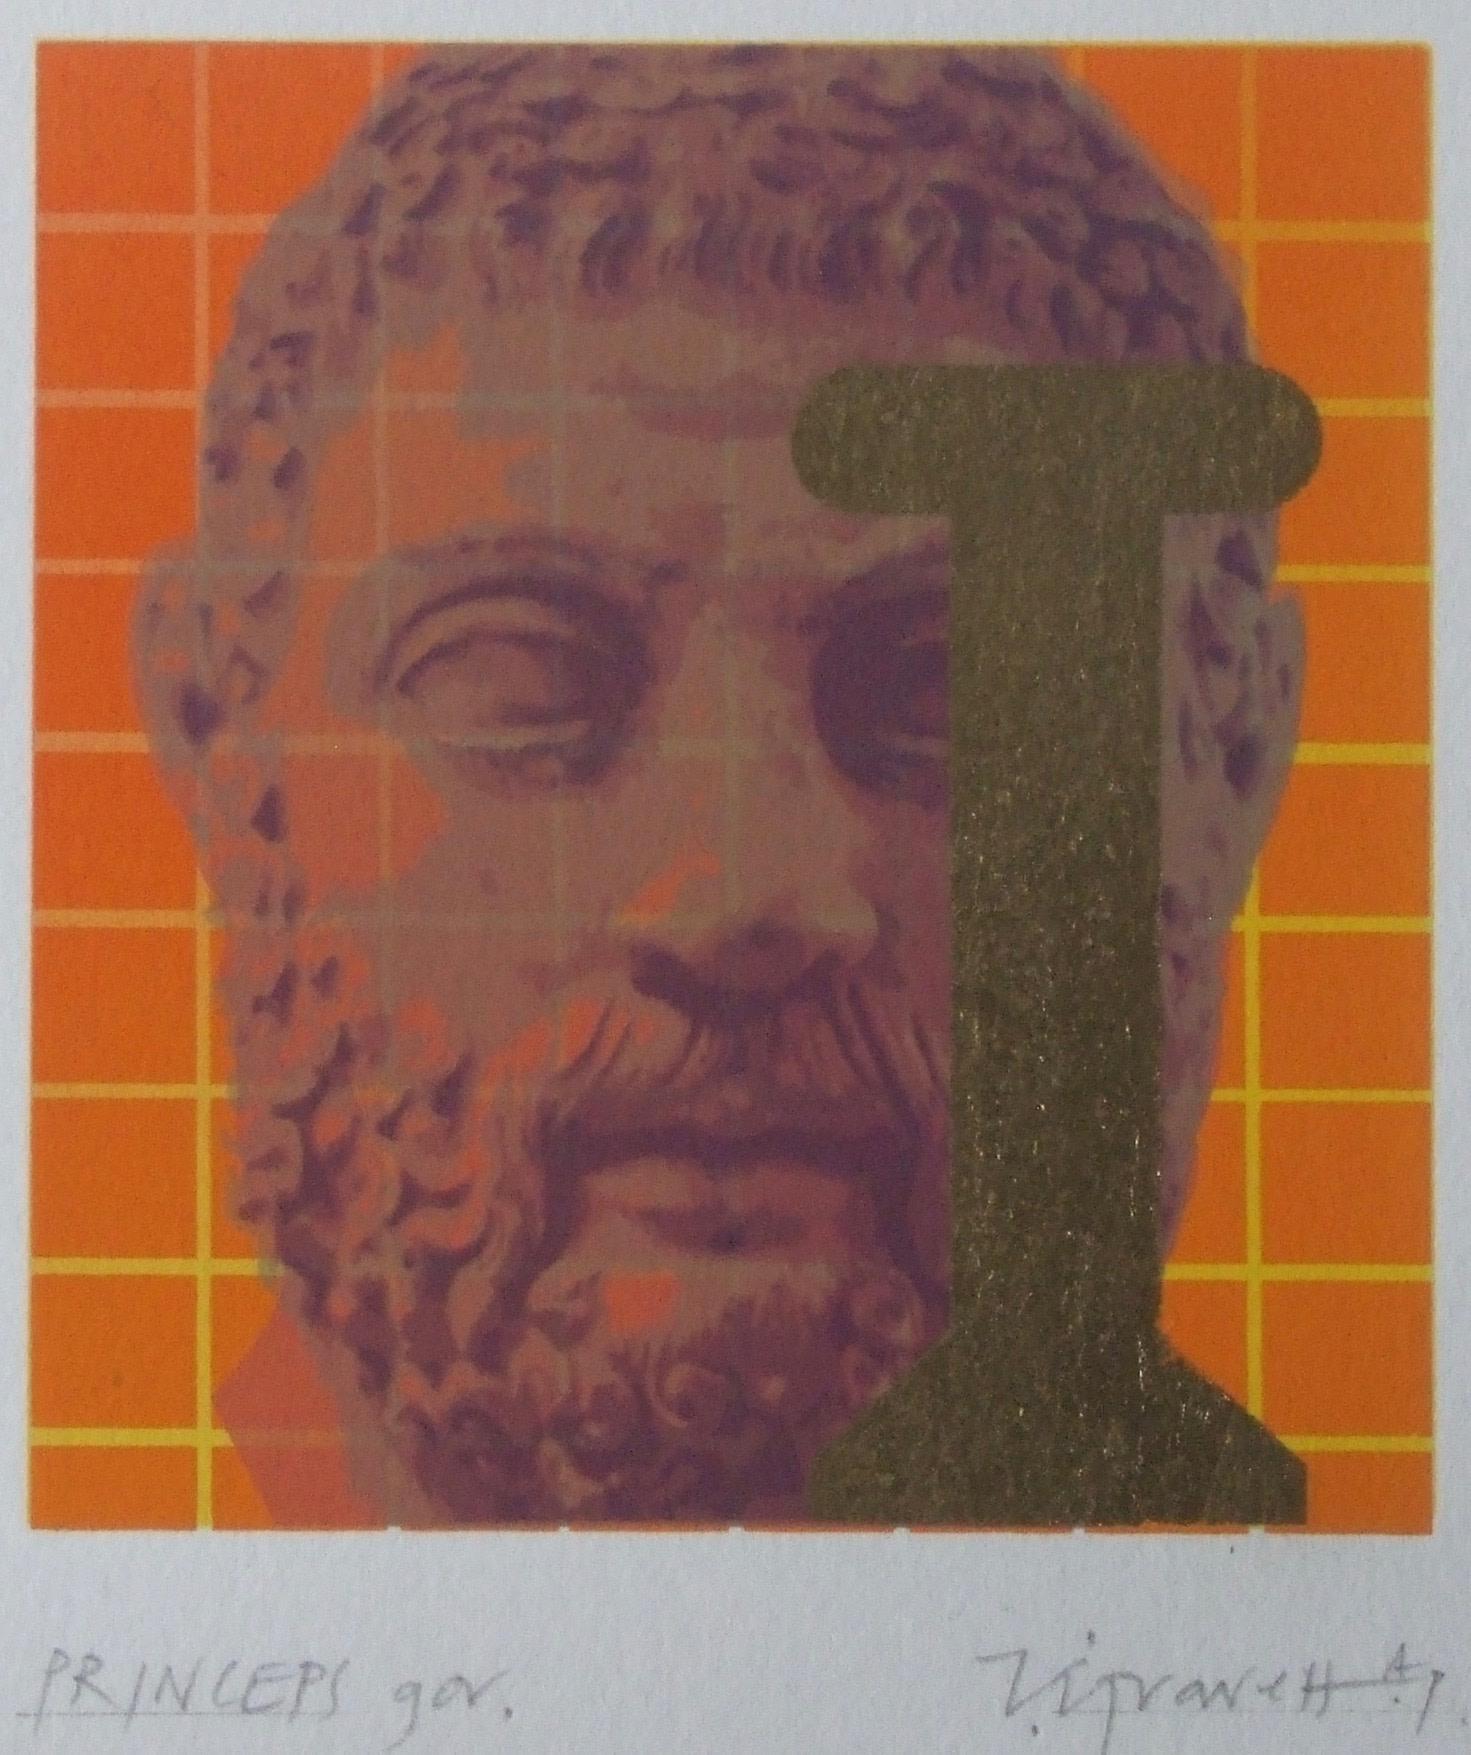 "<span class=""link fancybox-details-link""><a href=""/exhibitions/23/works/artworks_standalone11226/"">View Detail Page</a></span><div class=""artist""><span class=""artist""><strong>Terence Gravett ARE</strong></span></div><div class=""title""><em>Princeps Gov</em></div><div class=""medium"">screenprint & gold leaf</div><div class=""dimensions"">21 x 20 cm paper size<br>8.5 x 9 cm image size</div><div class=""edition_details"">edition of 10</div>"